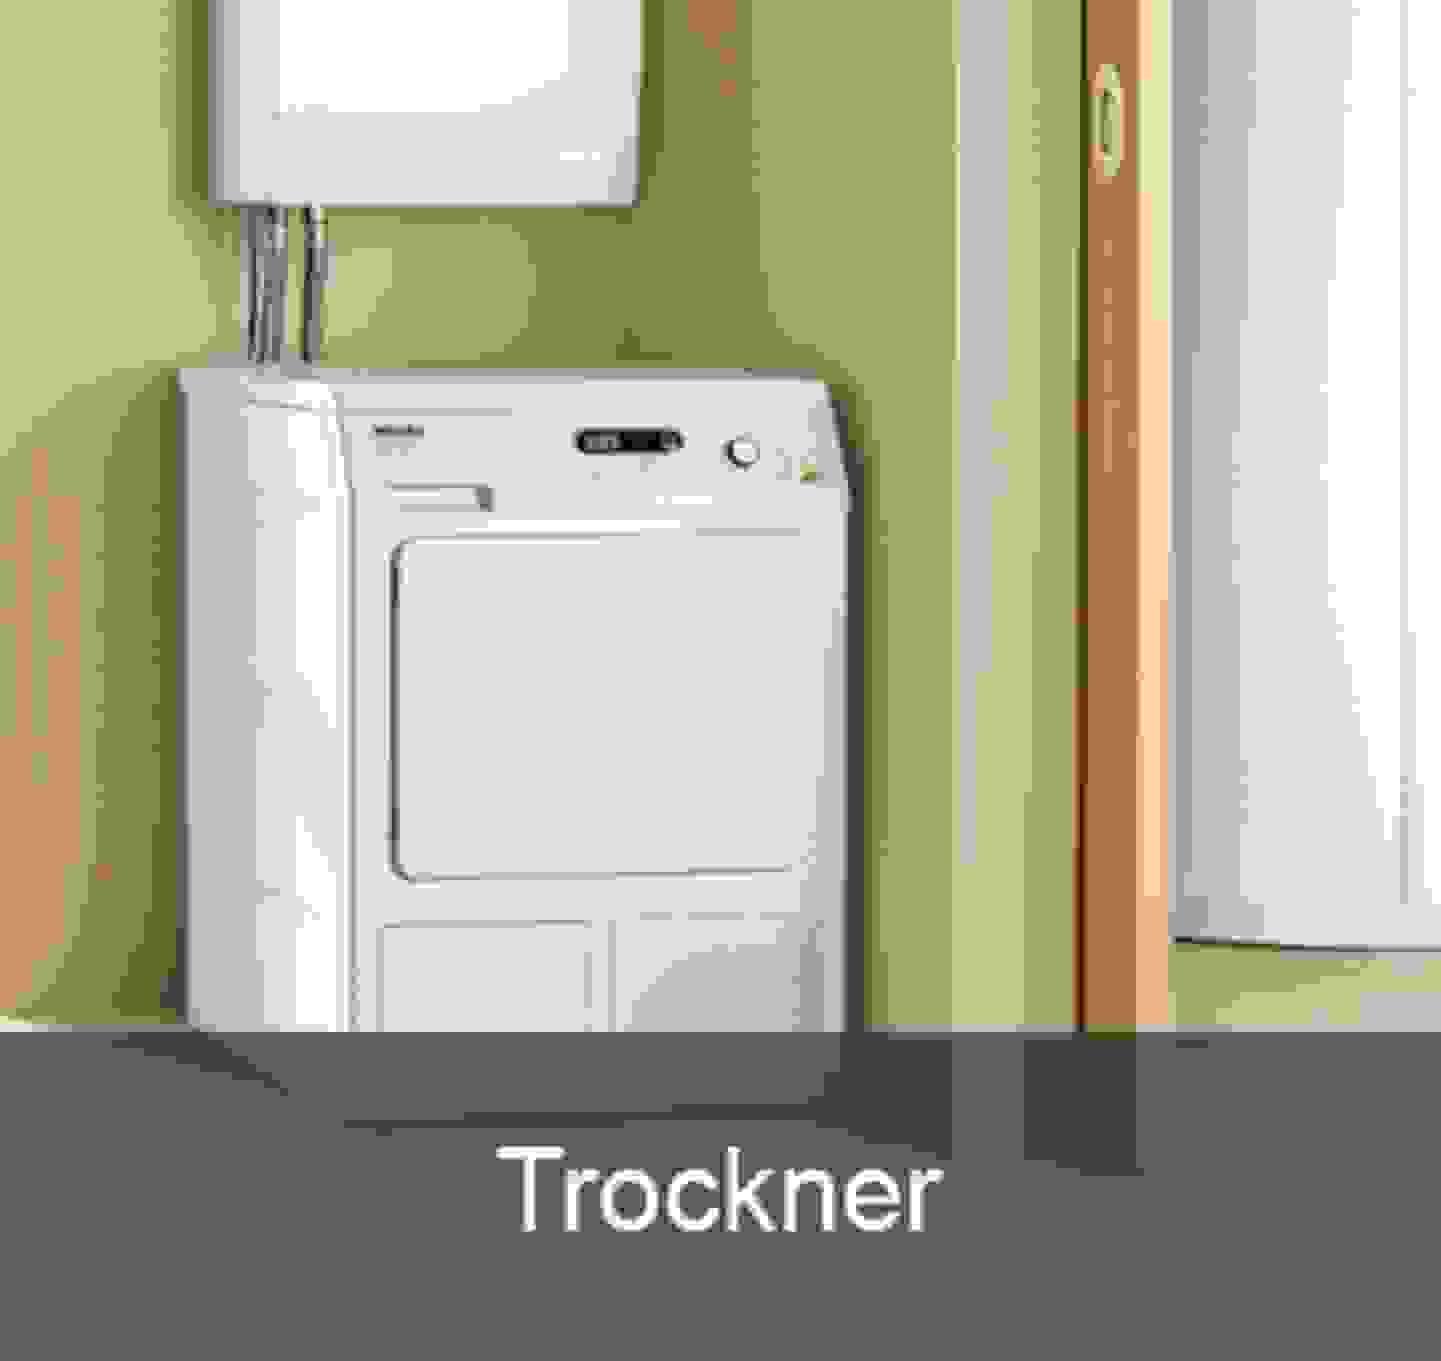 Trockner